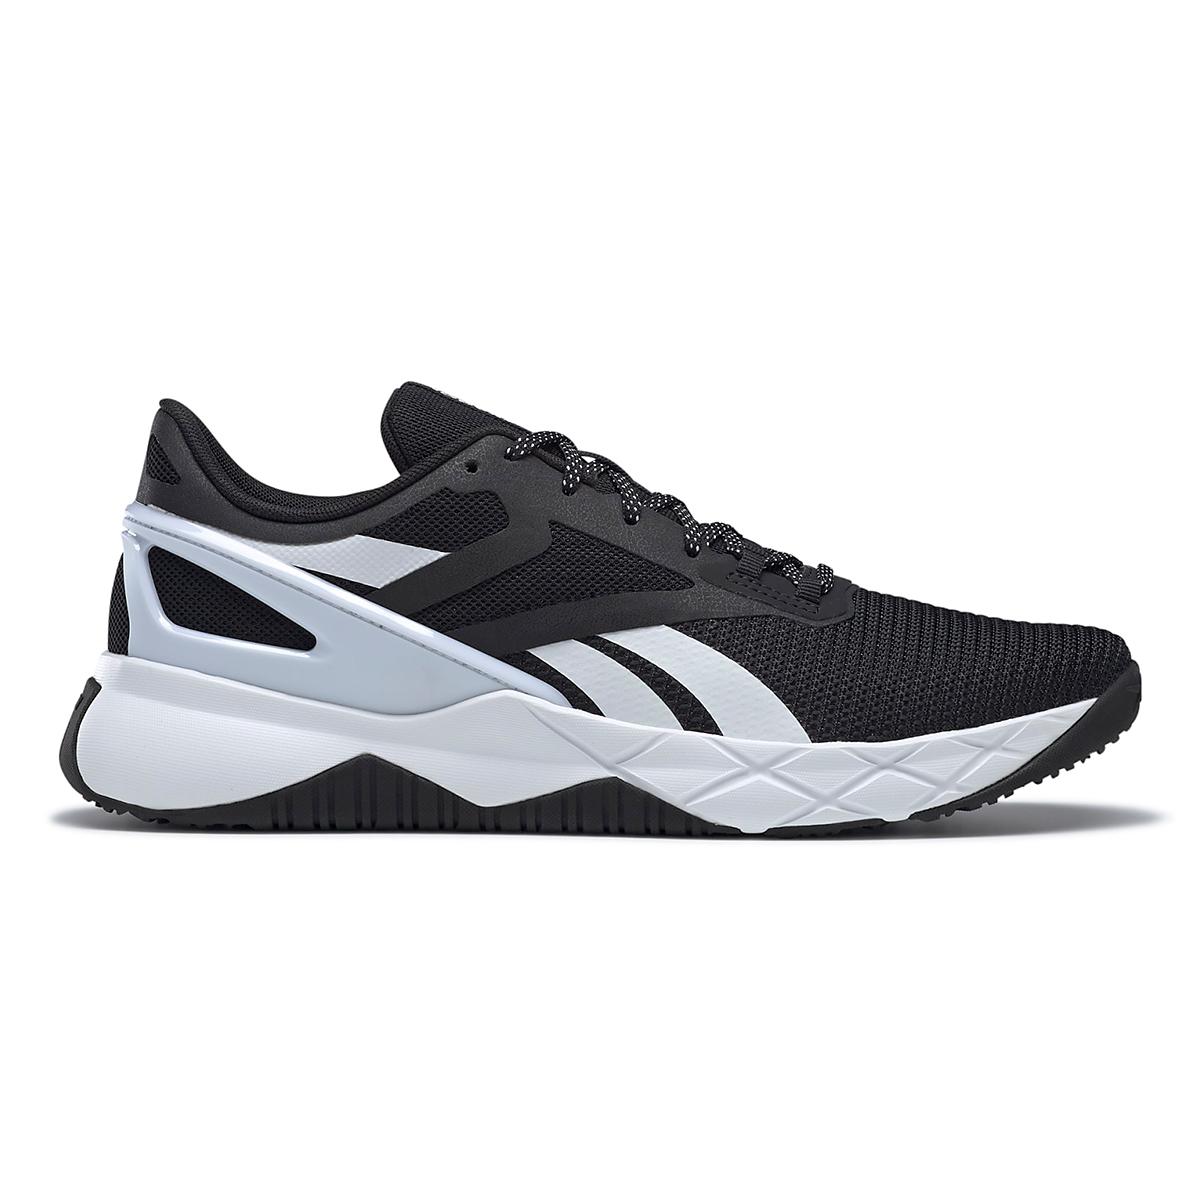 Men's Reebok Nanoflex TR Training Shoe - Color: Core Black/White/Core Black - Size: 6.5 - Width: Regular, Core Black/White/Core Black, large, image 1